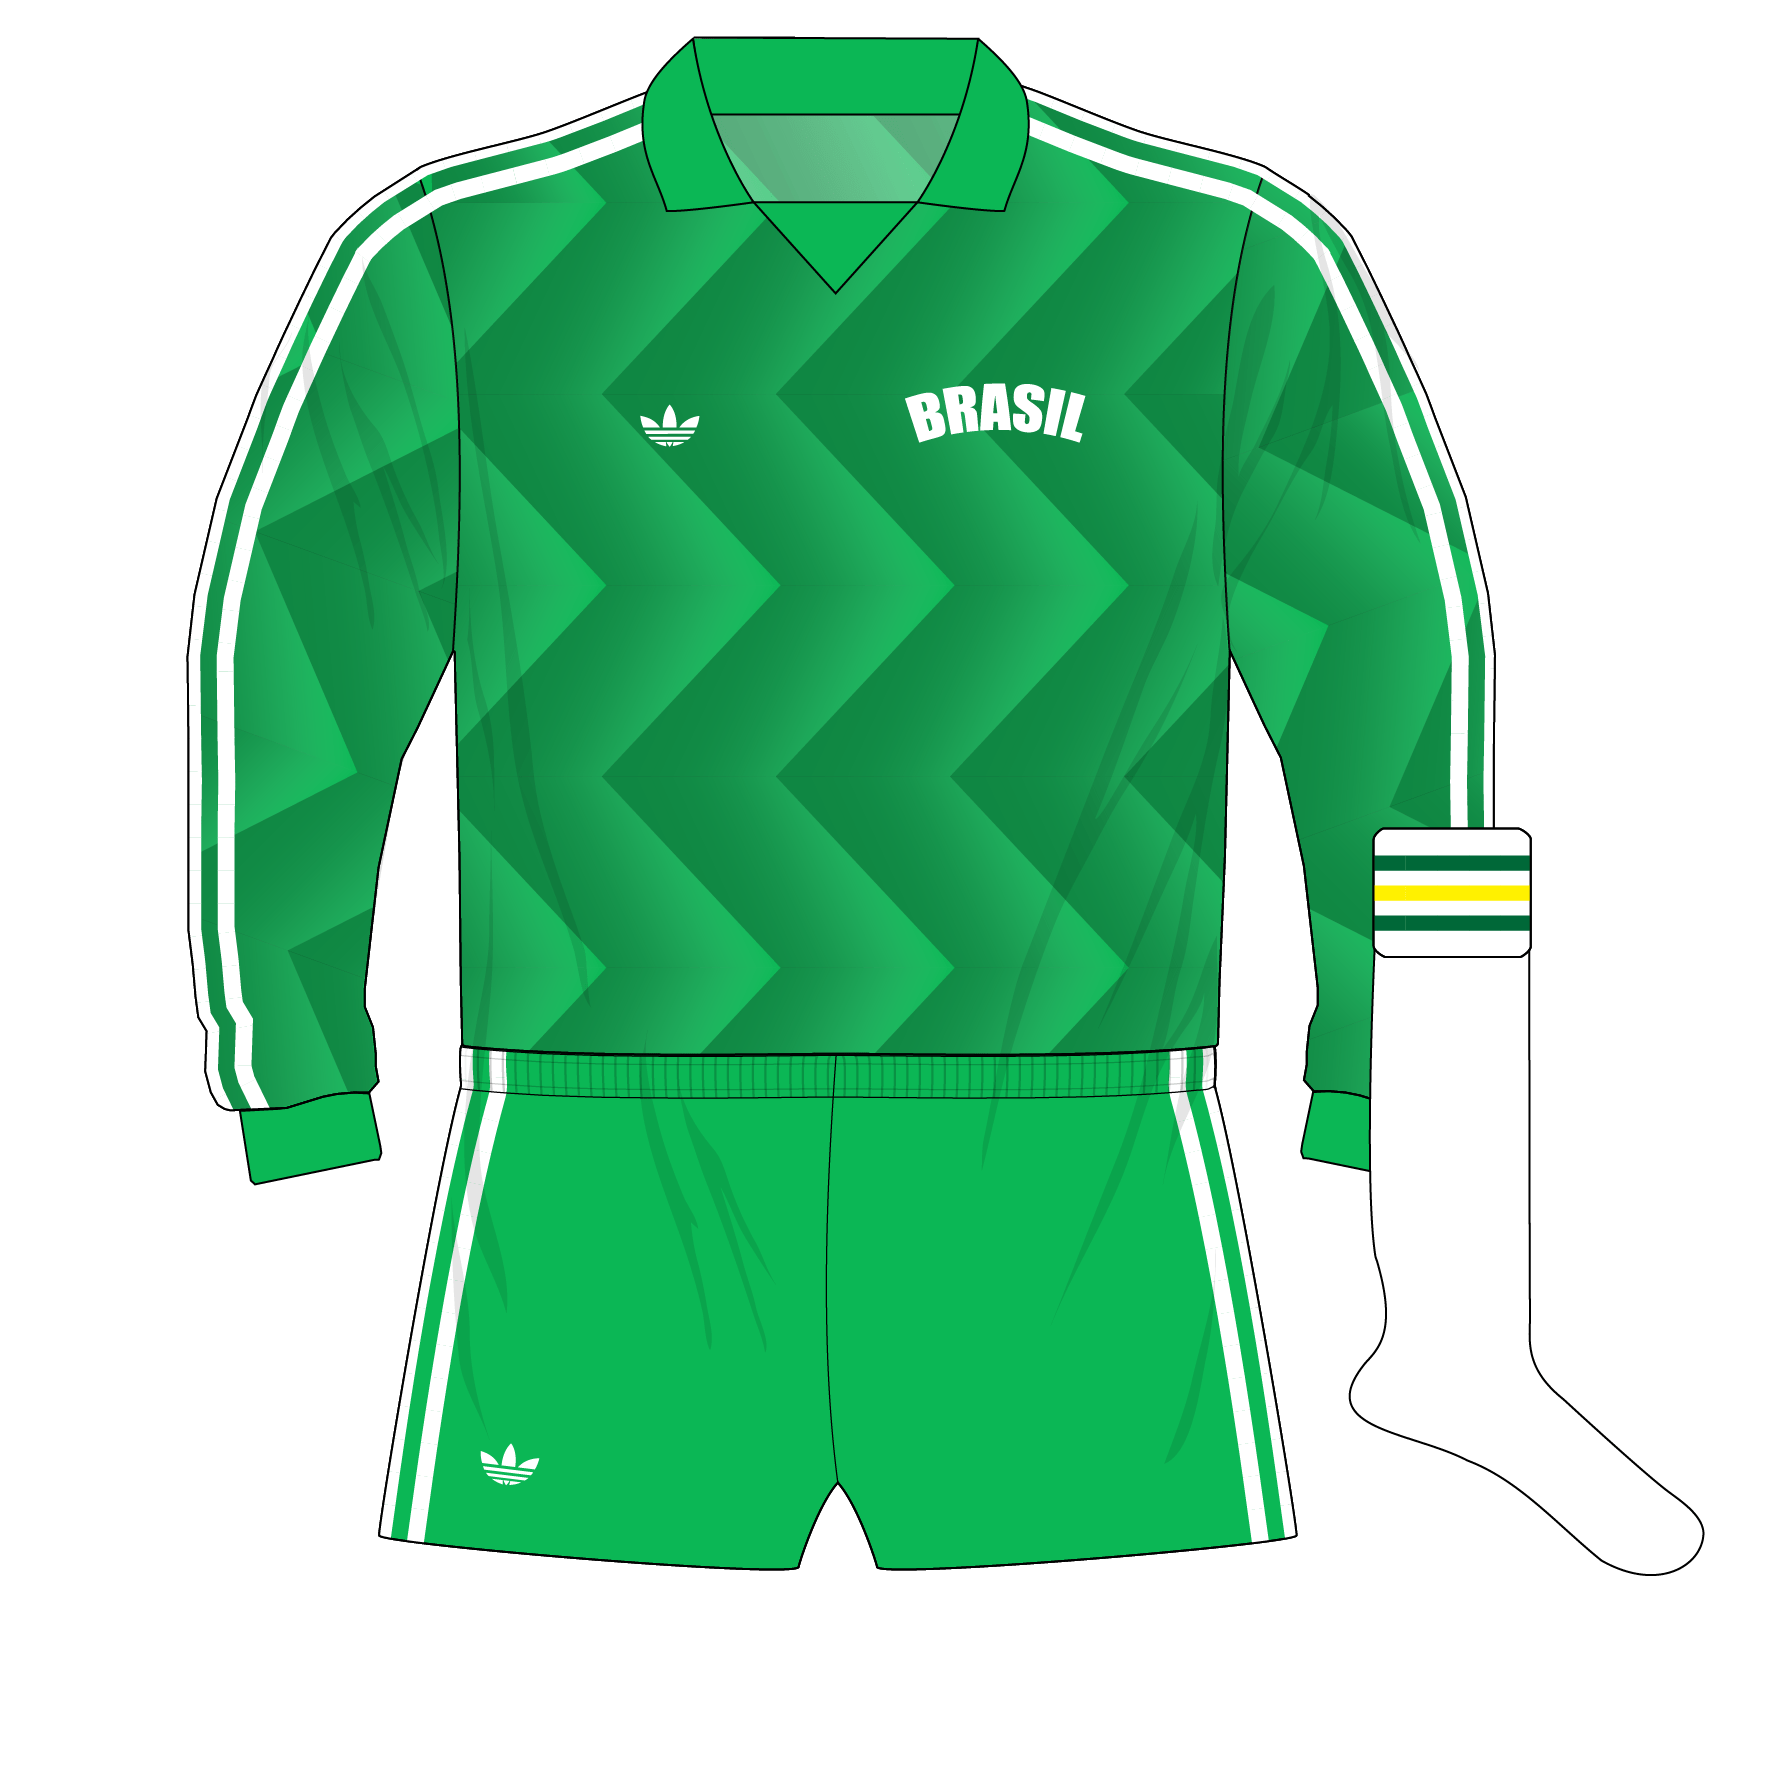 adidas-Brazil-goalkeeper-shirt-golerio-Taffarel-1988-Olympics-green-01